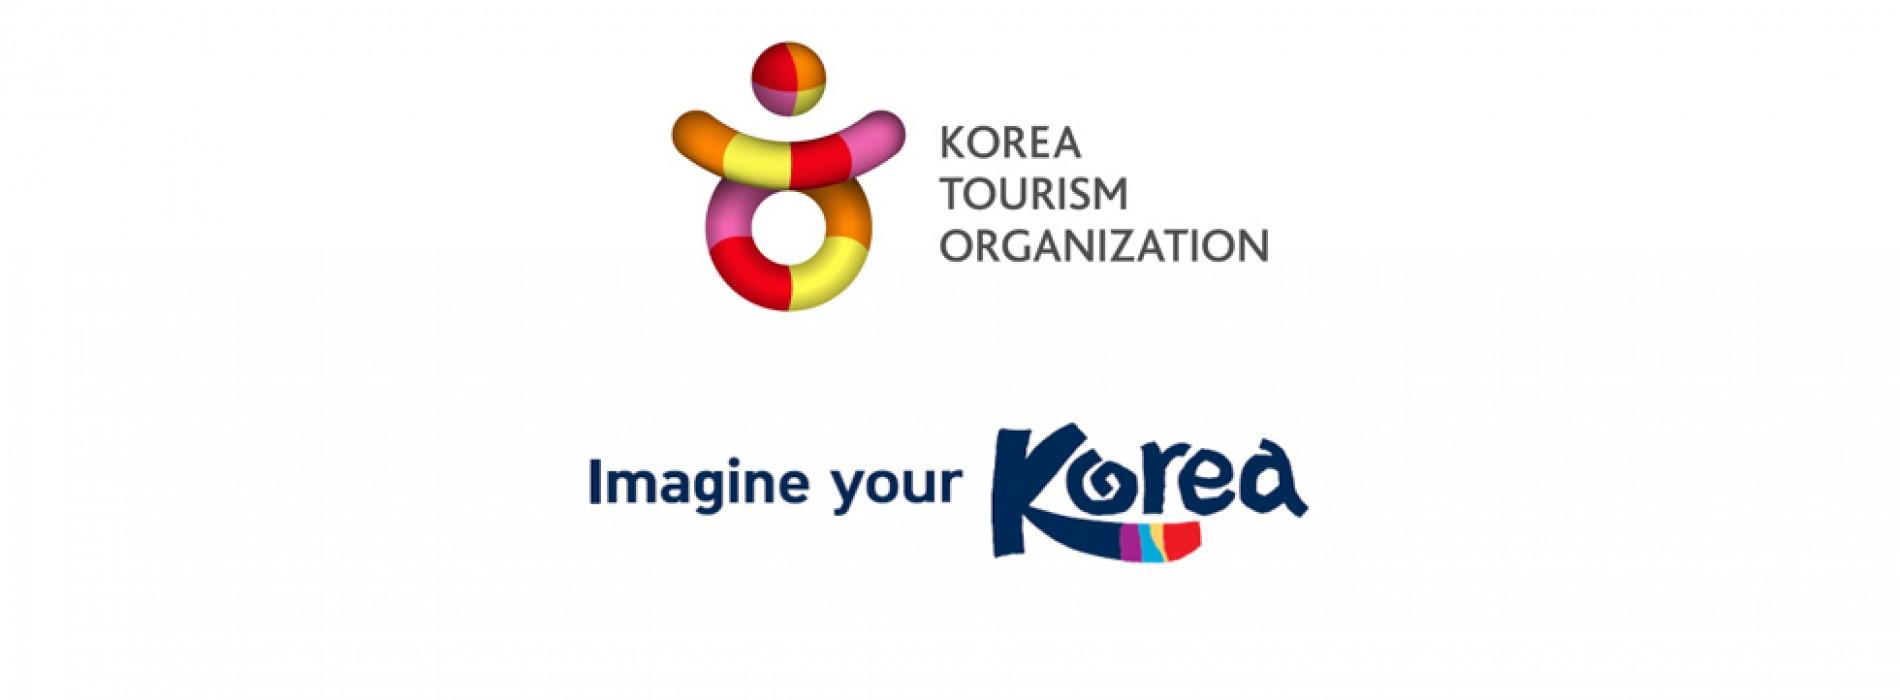 Delhi to witness a Grand Korean Grandeur in November